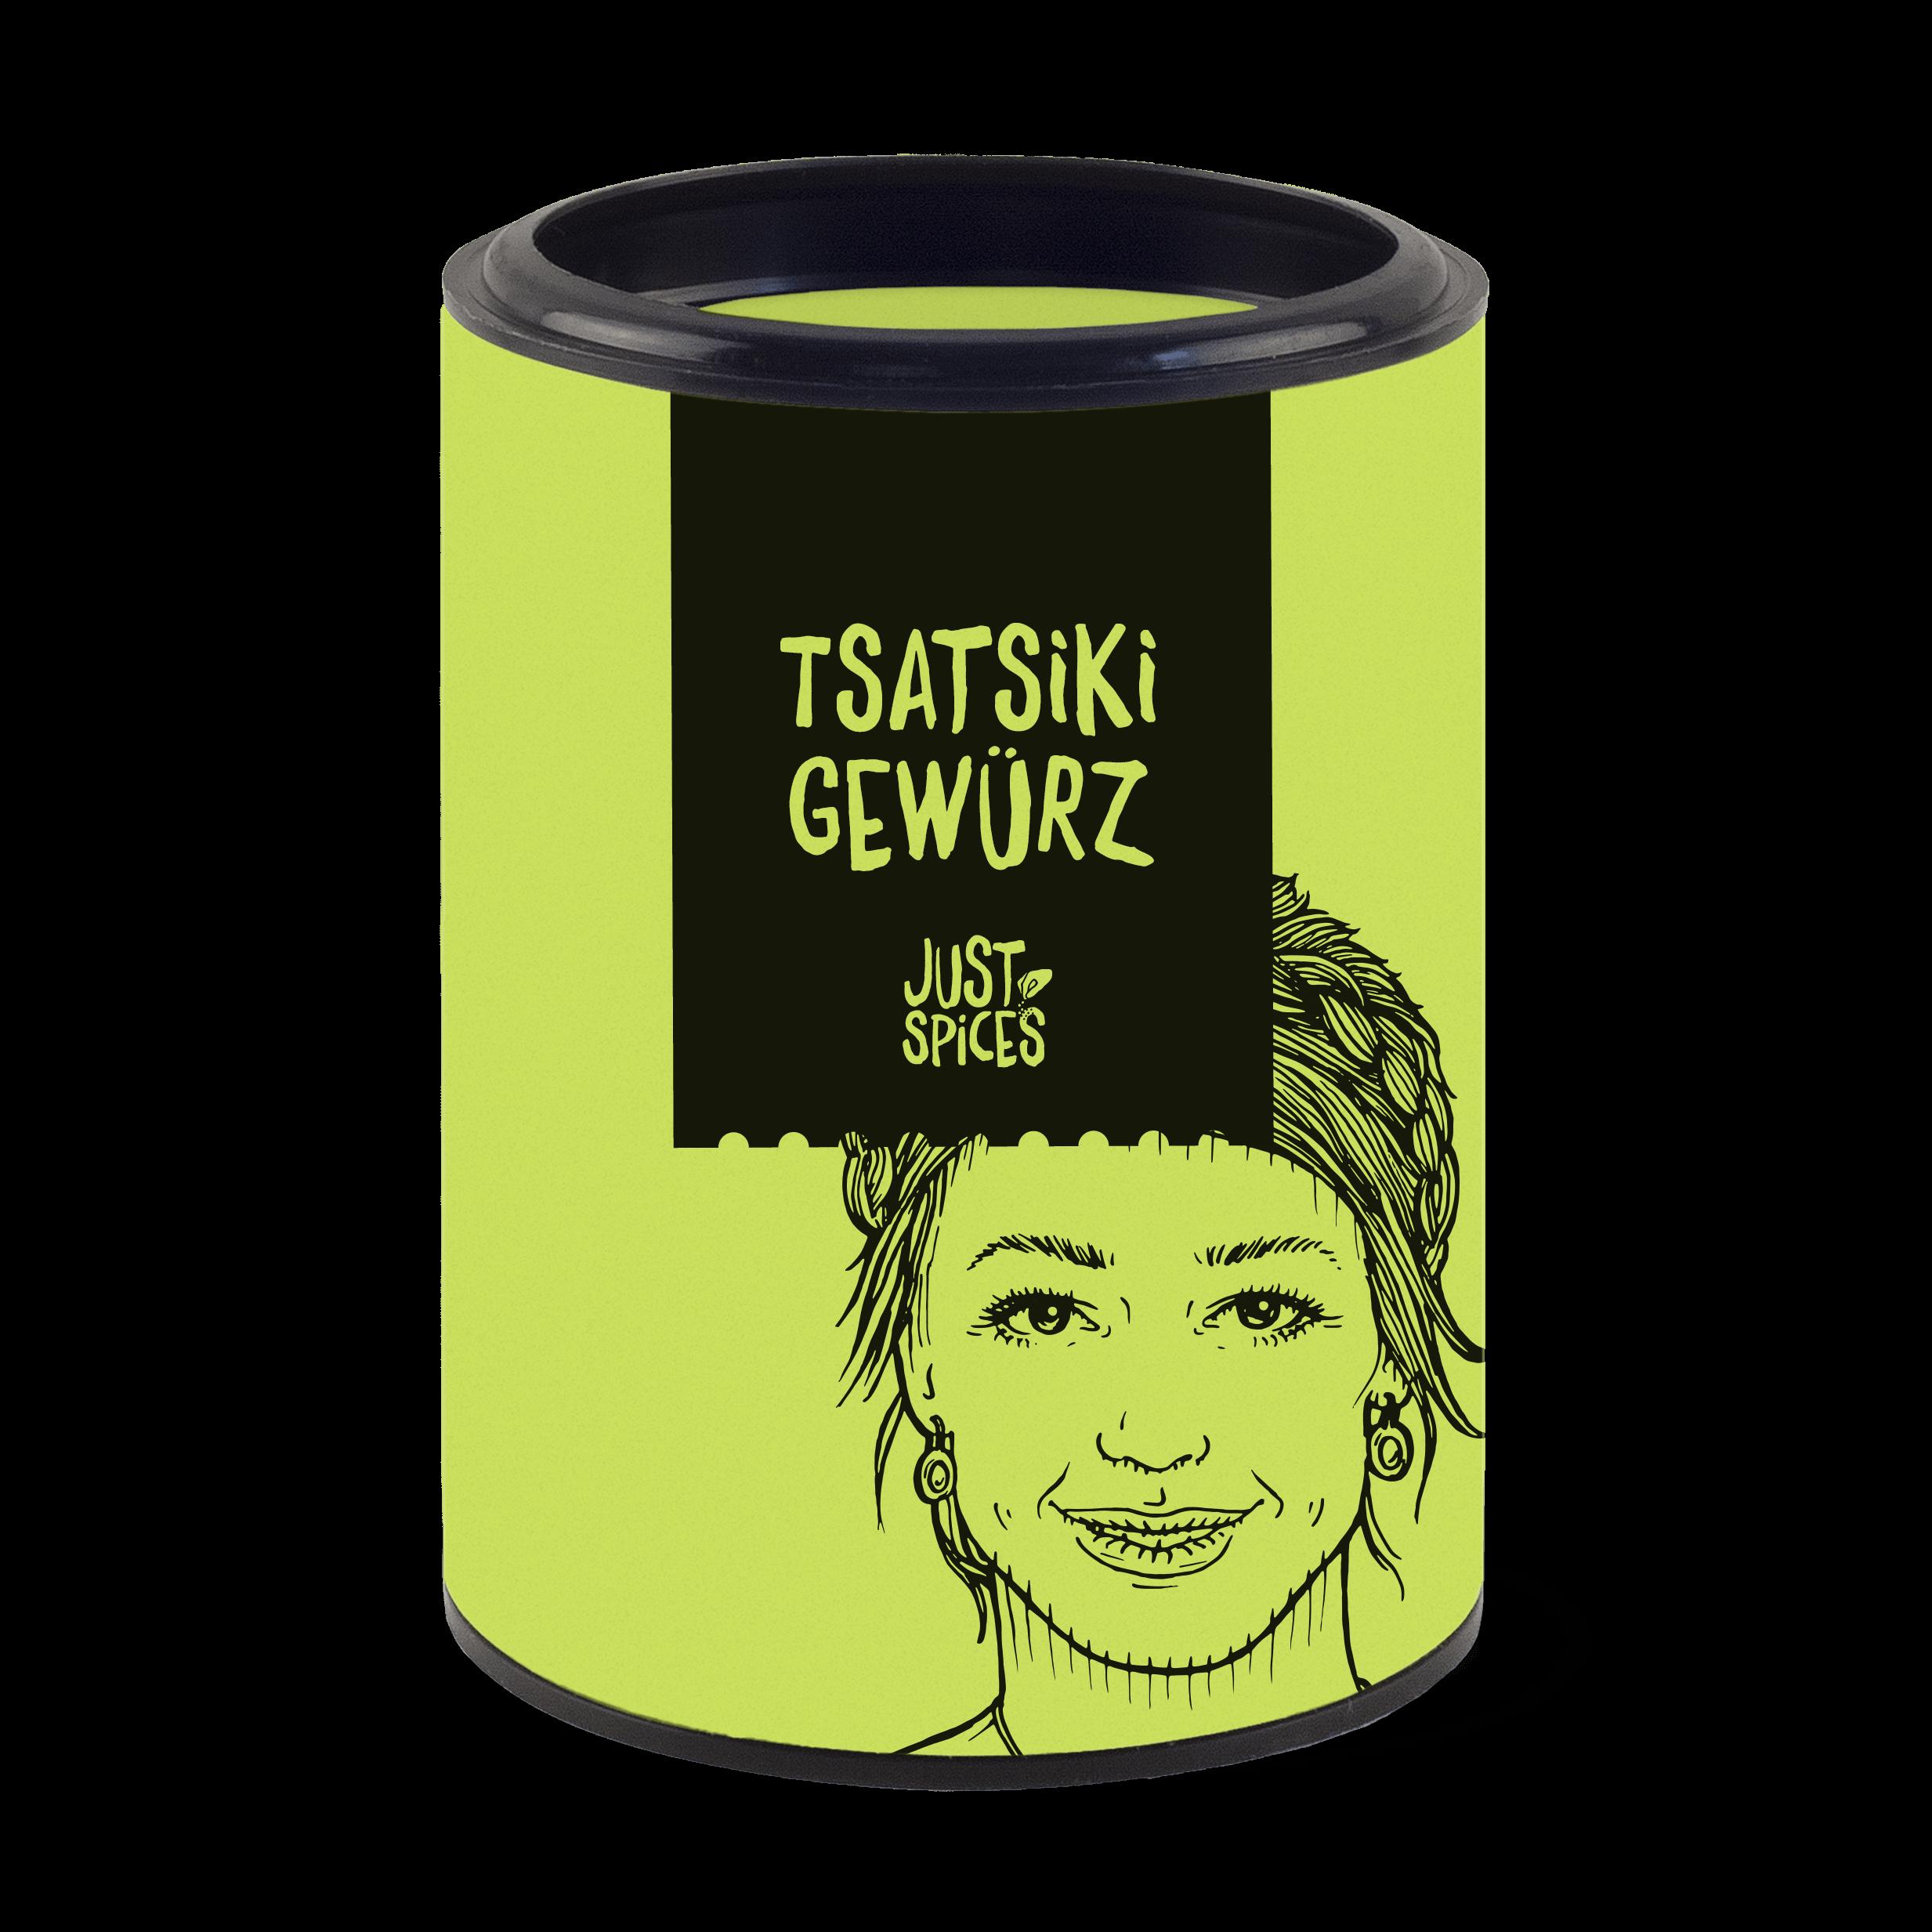 Tsatsiki Gewürz